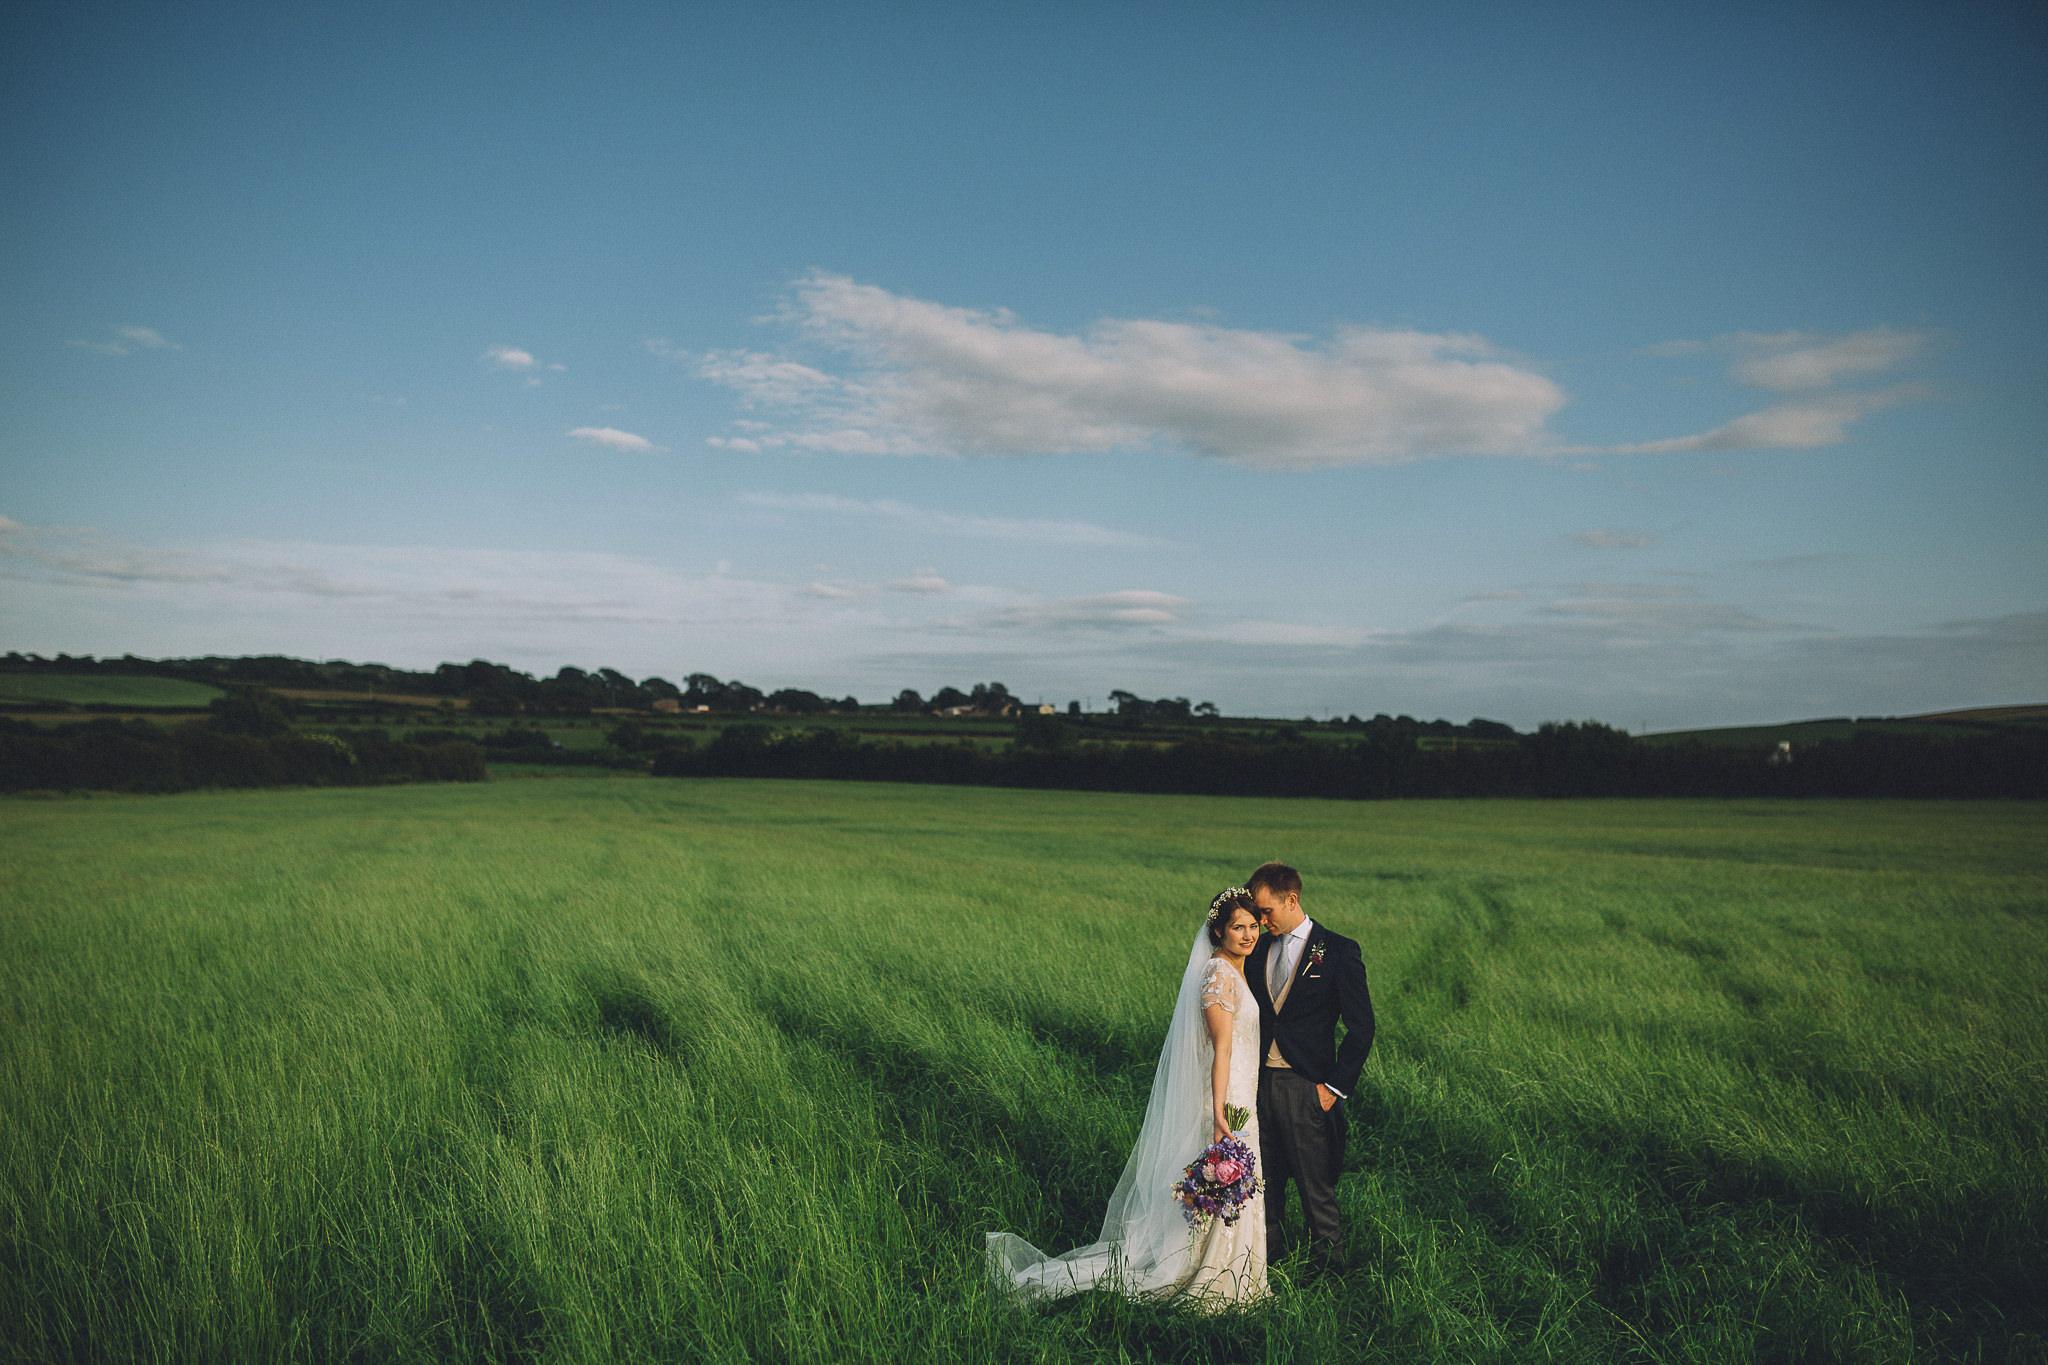 paul-marbrook-Farm-Wedding-Photographer-Lancashire-90068